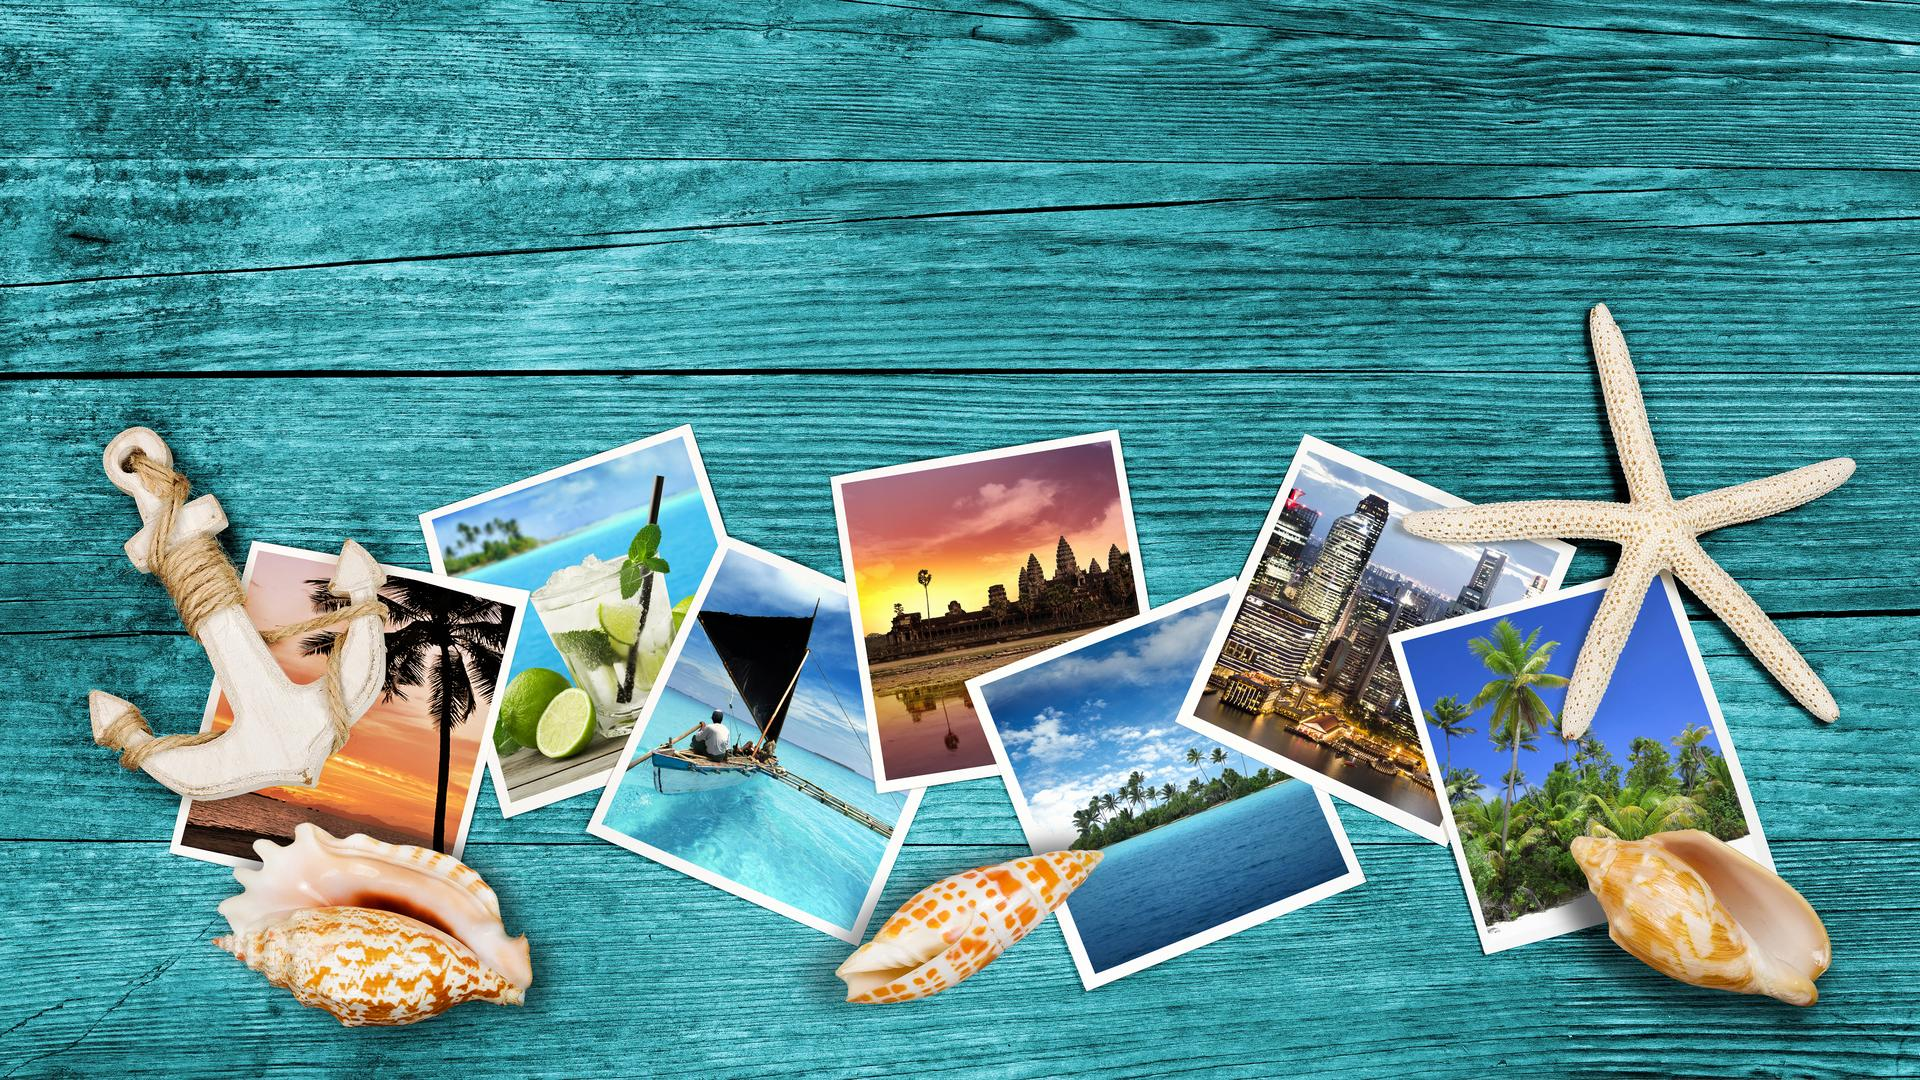 main photo background